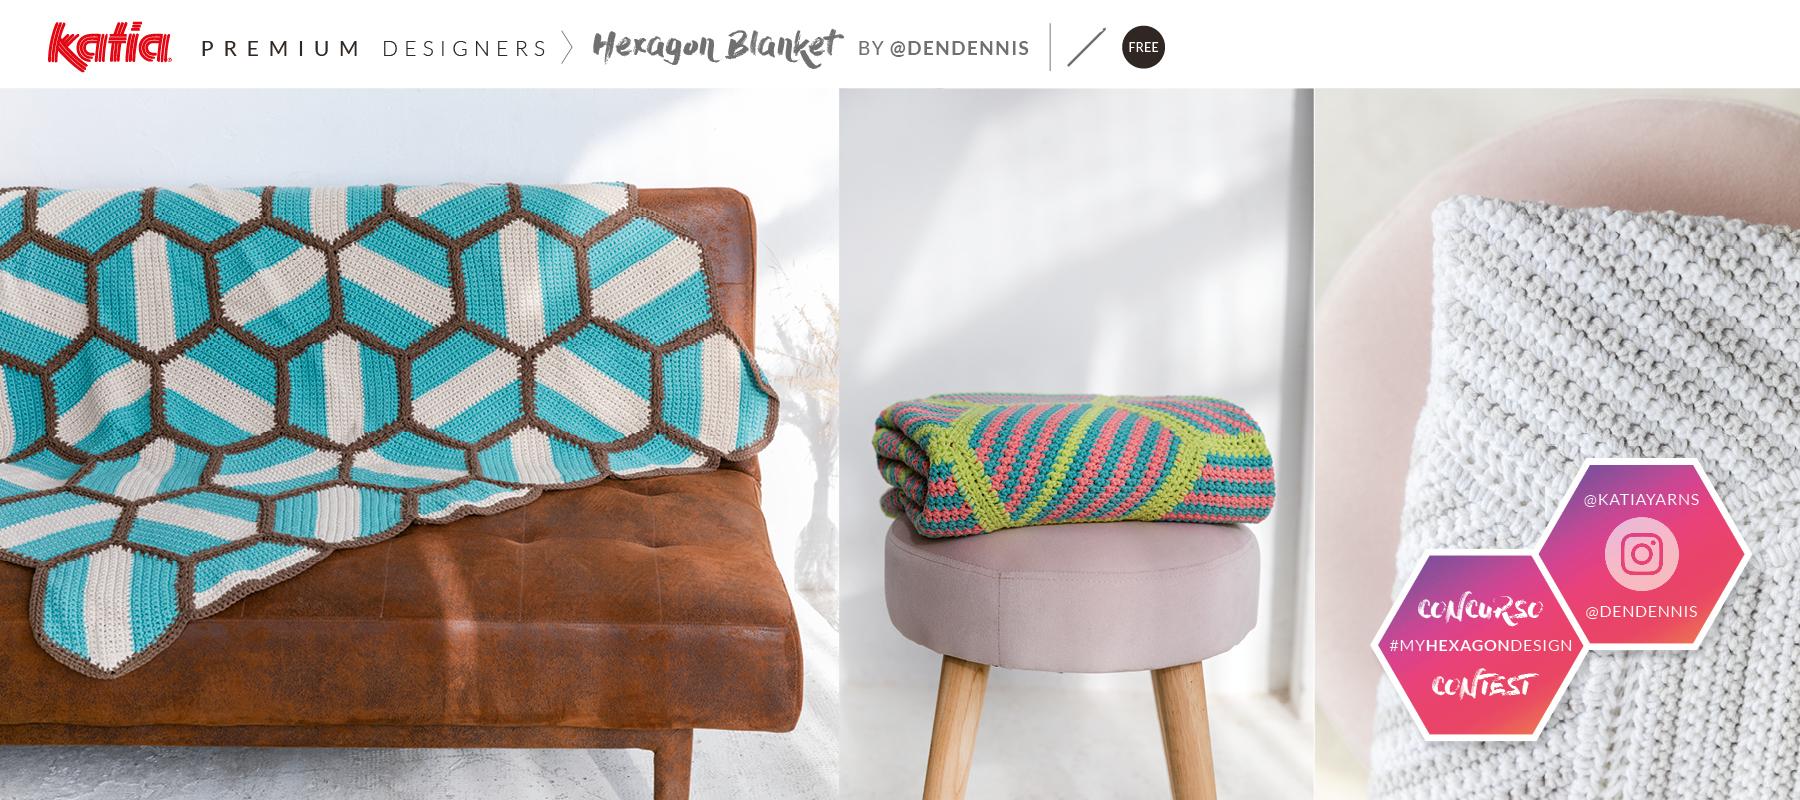 Hexagon-Blanket-Häkeldecke-Sechsecke-Anleitung